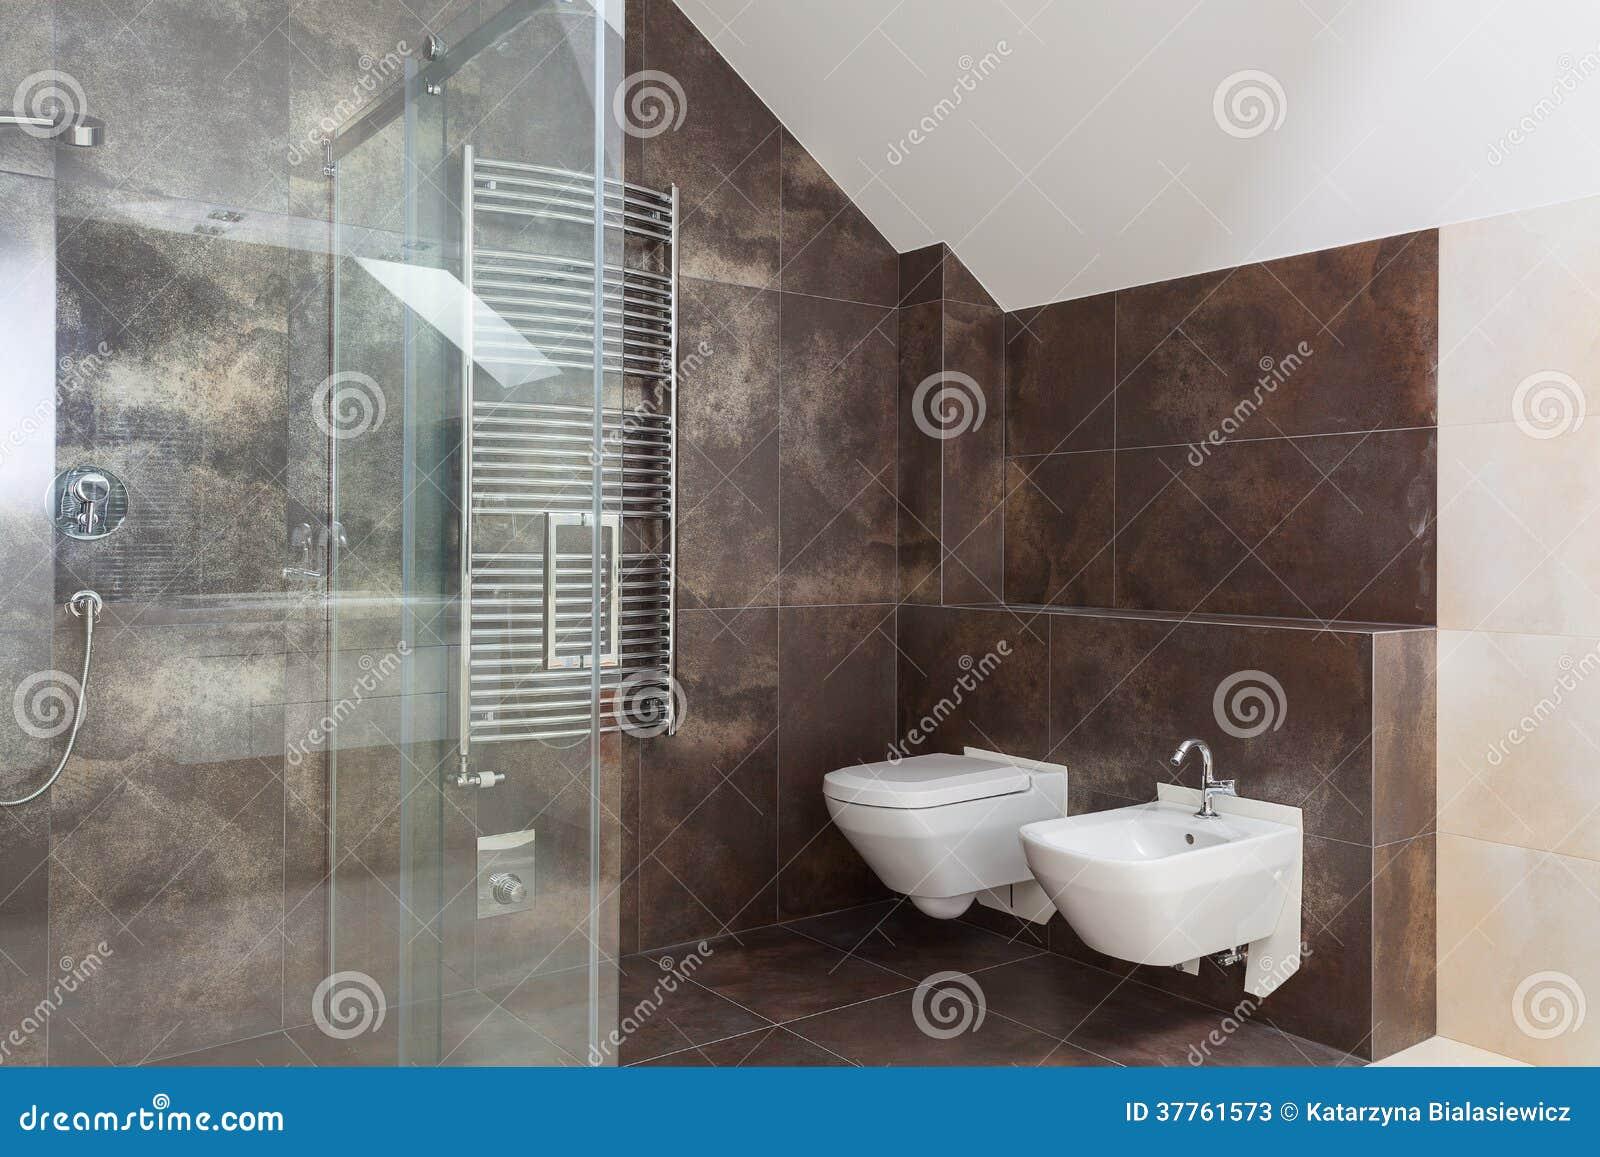 Bruine tegels in moderne badkamers stock afbeelding for Bruine tegels